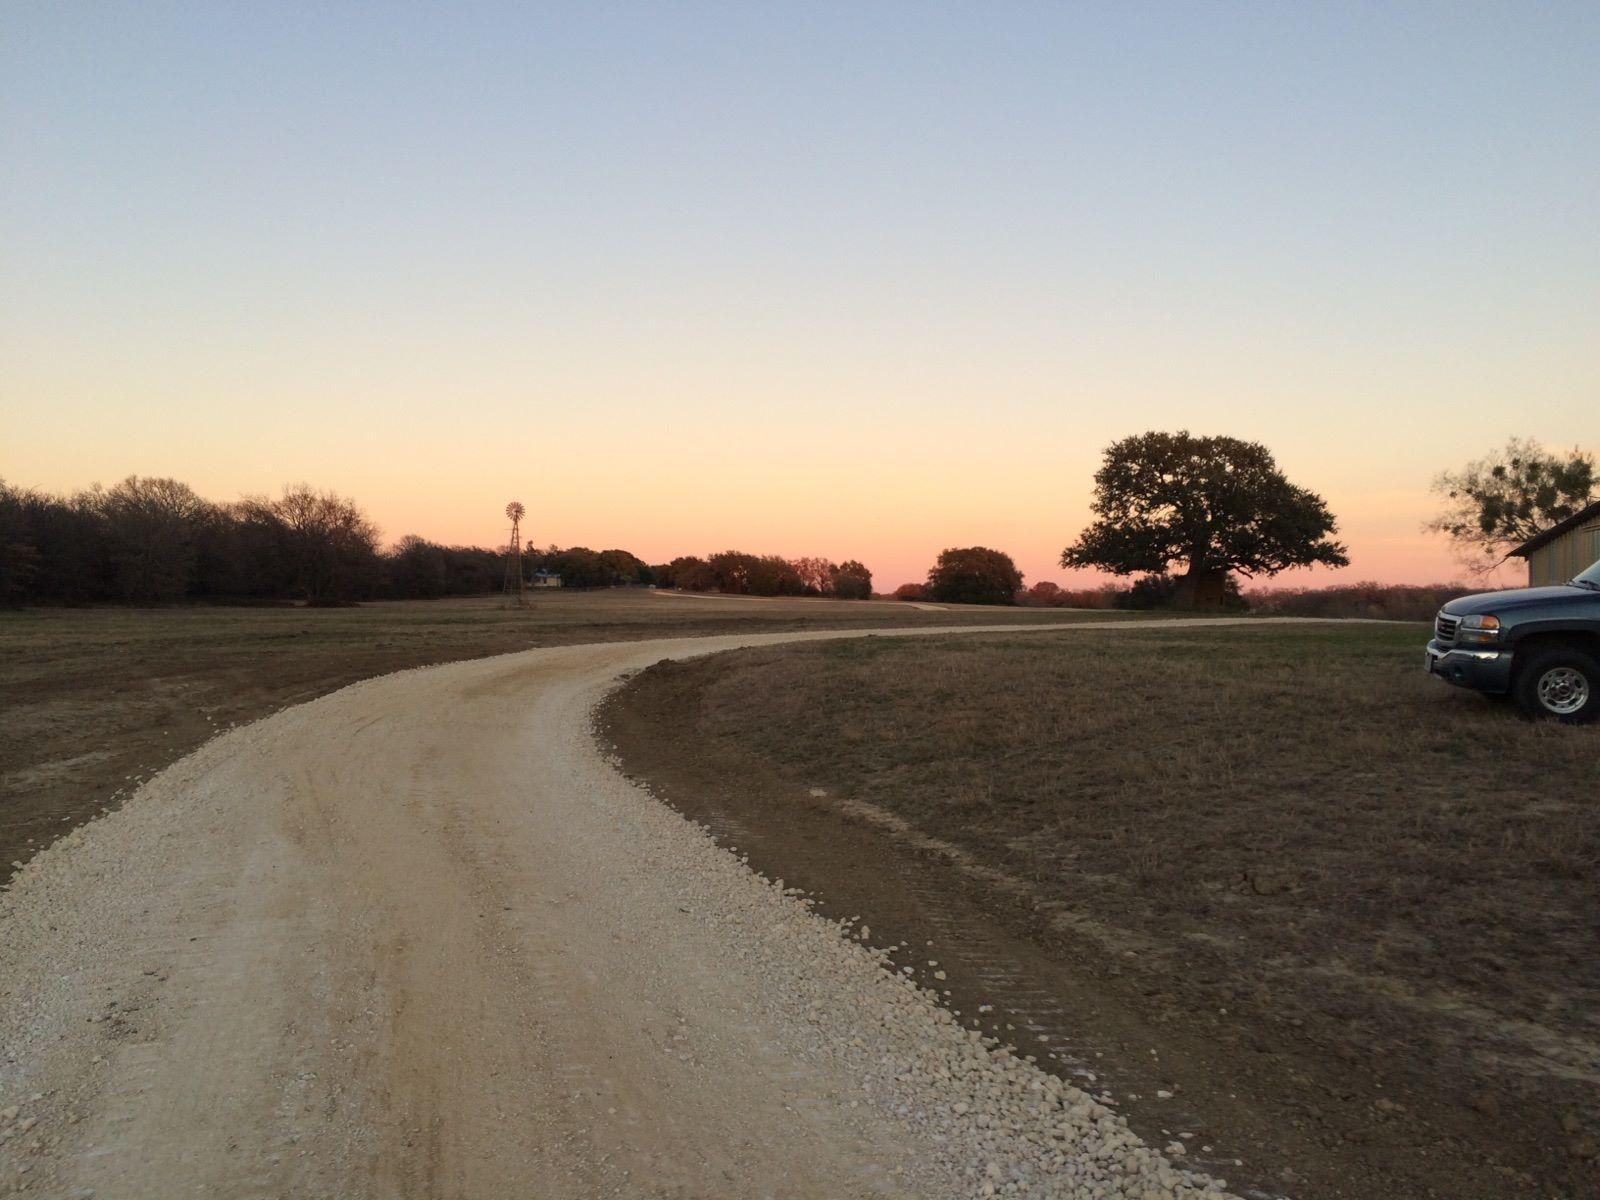 Rework existing rural roadway